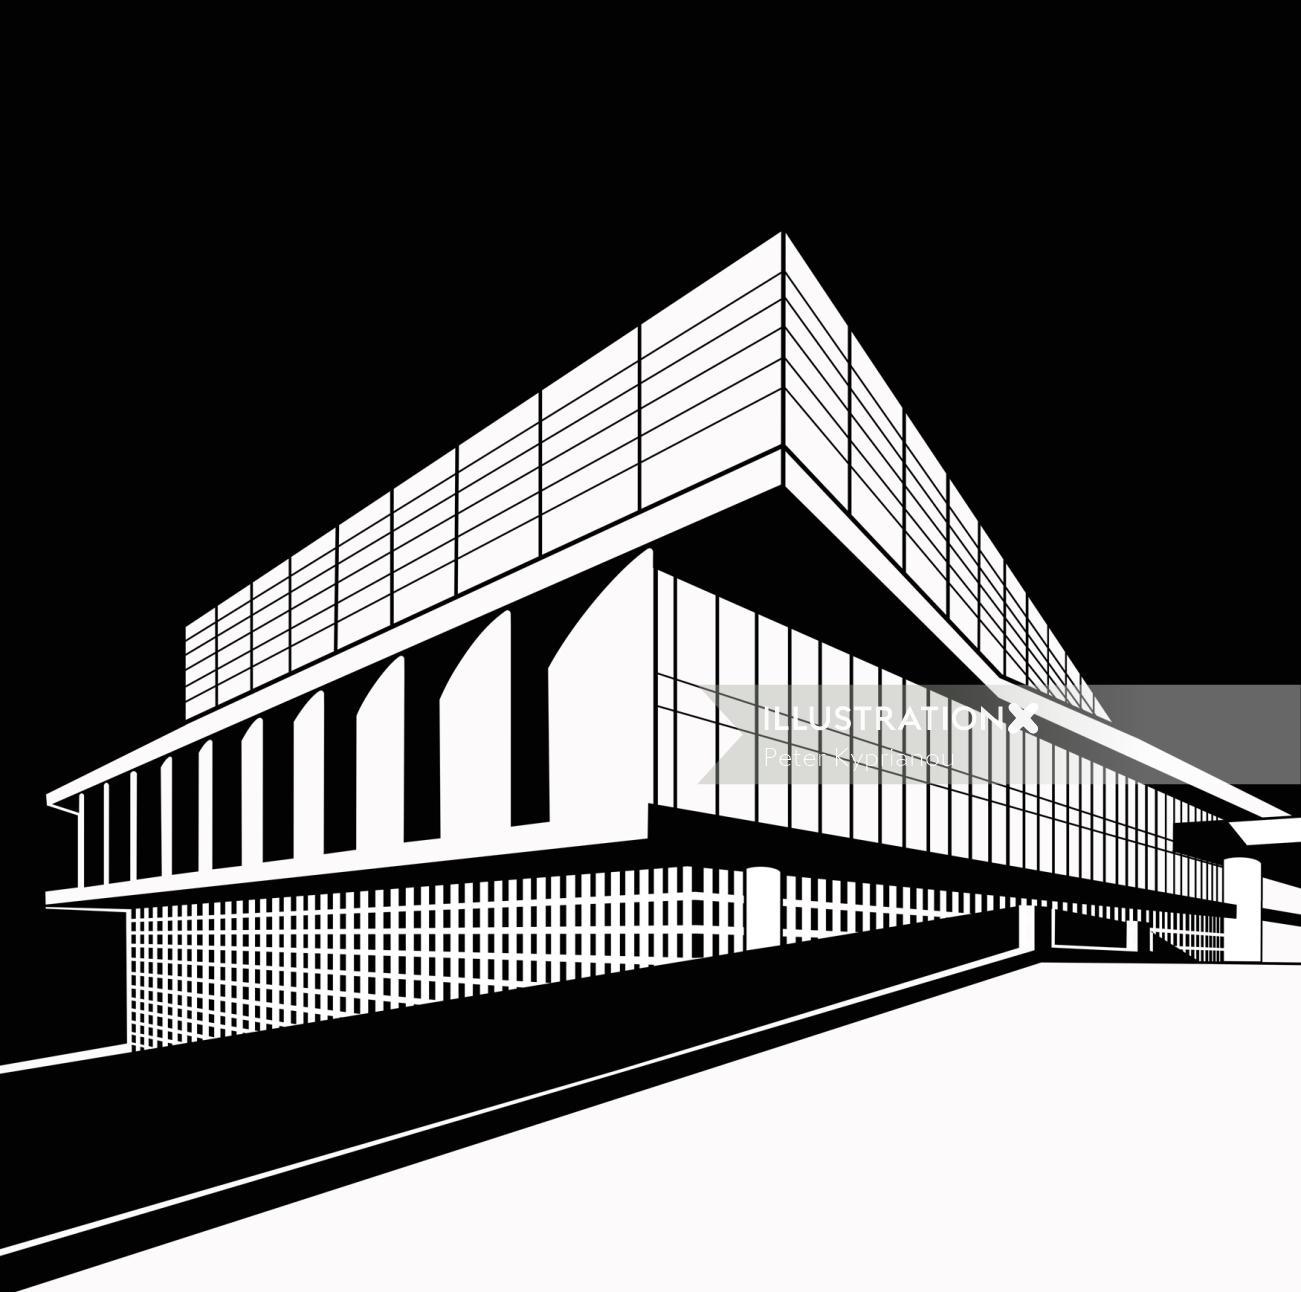 stylish black and white architecture